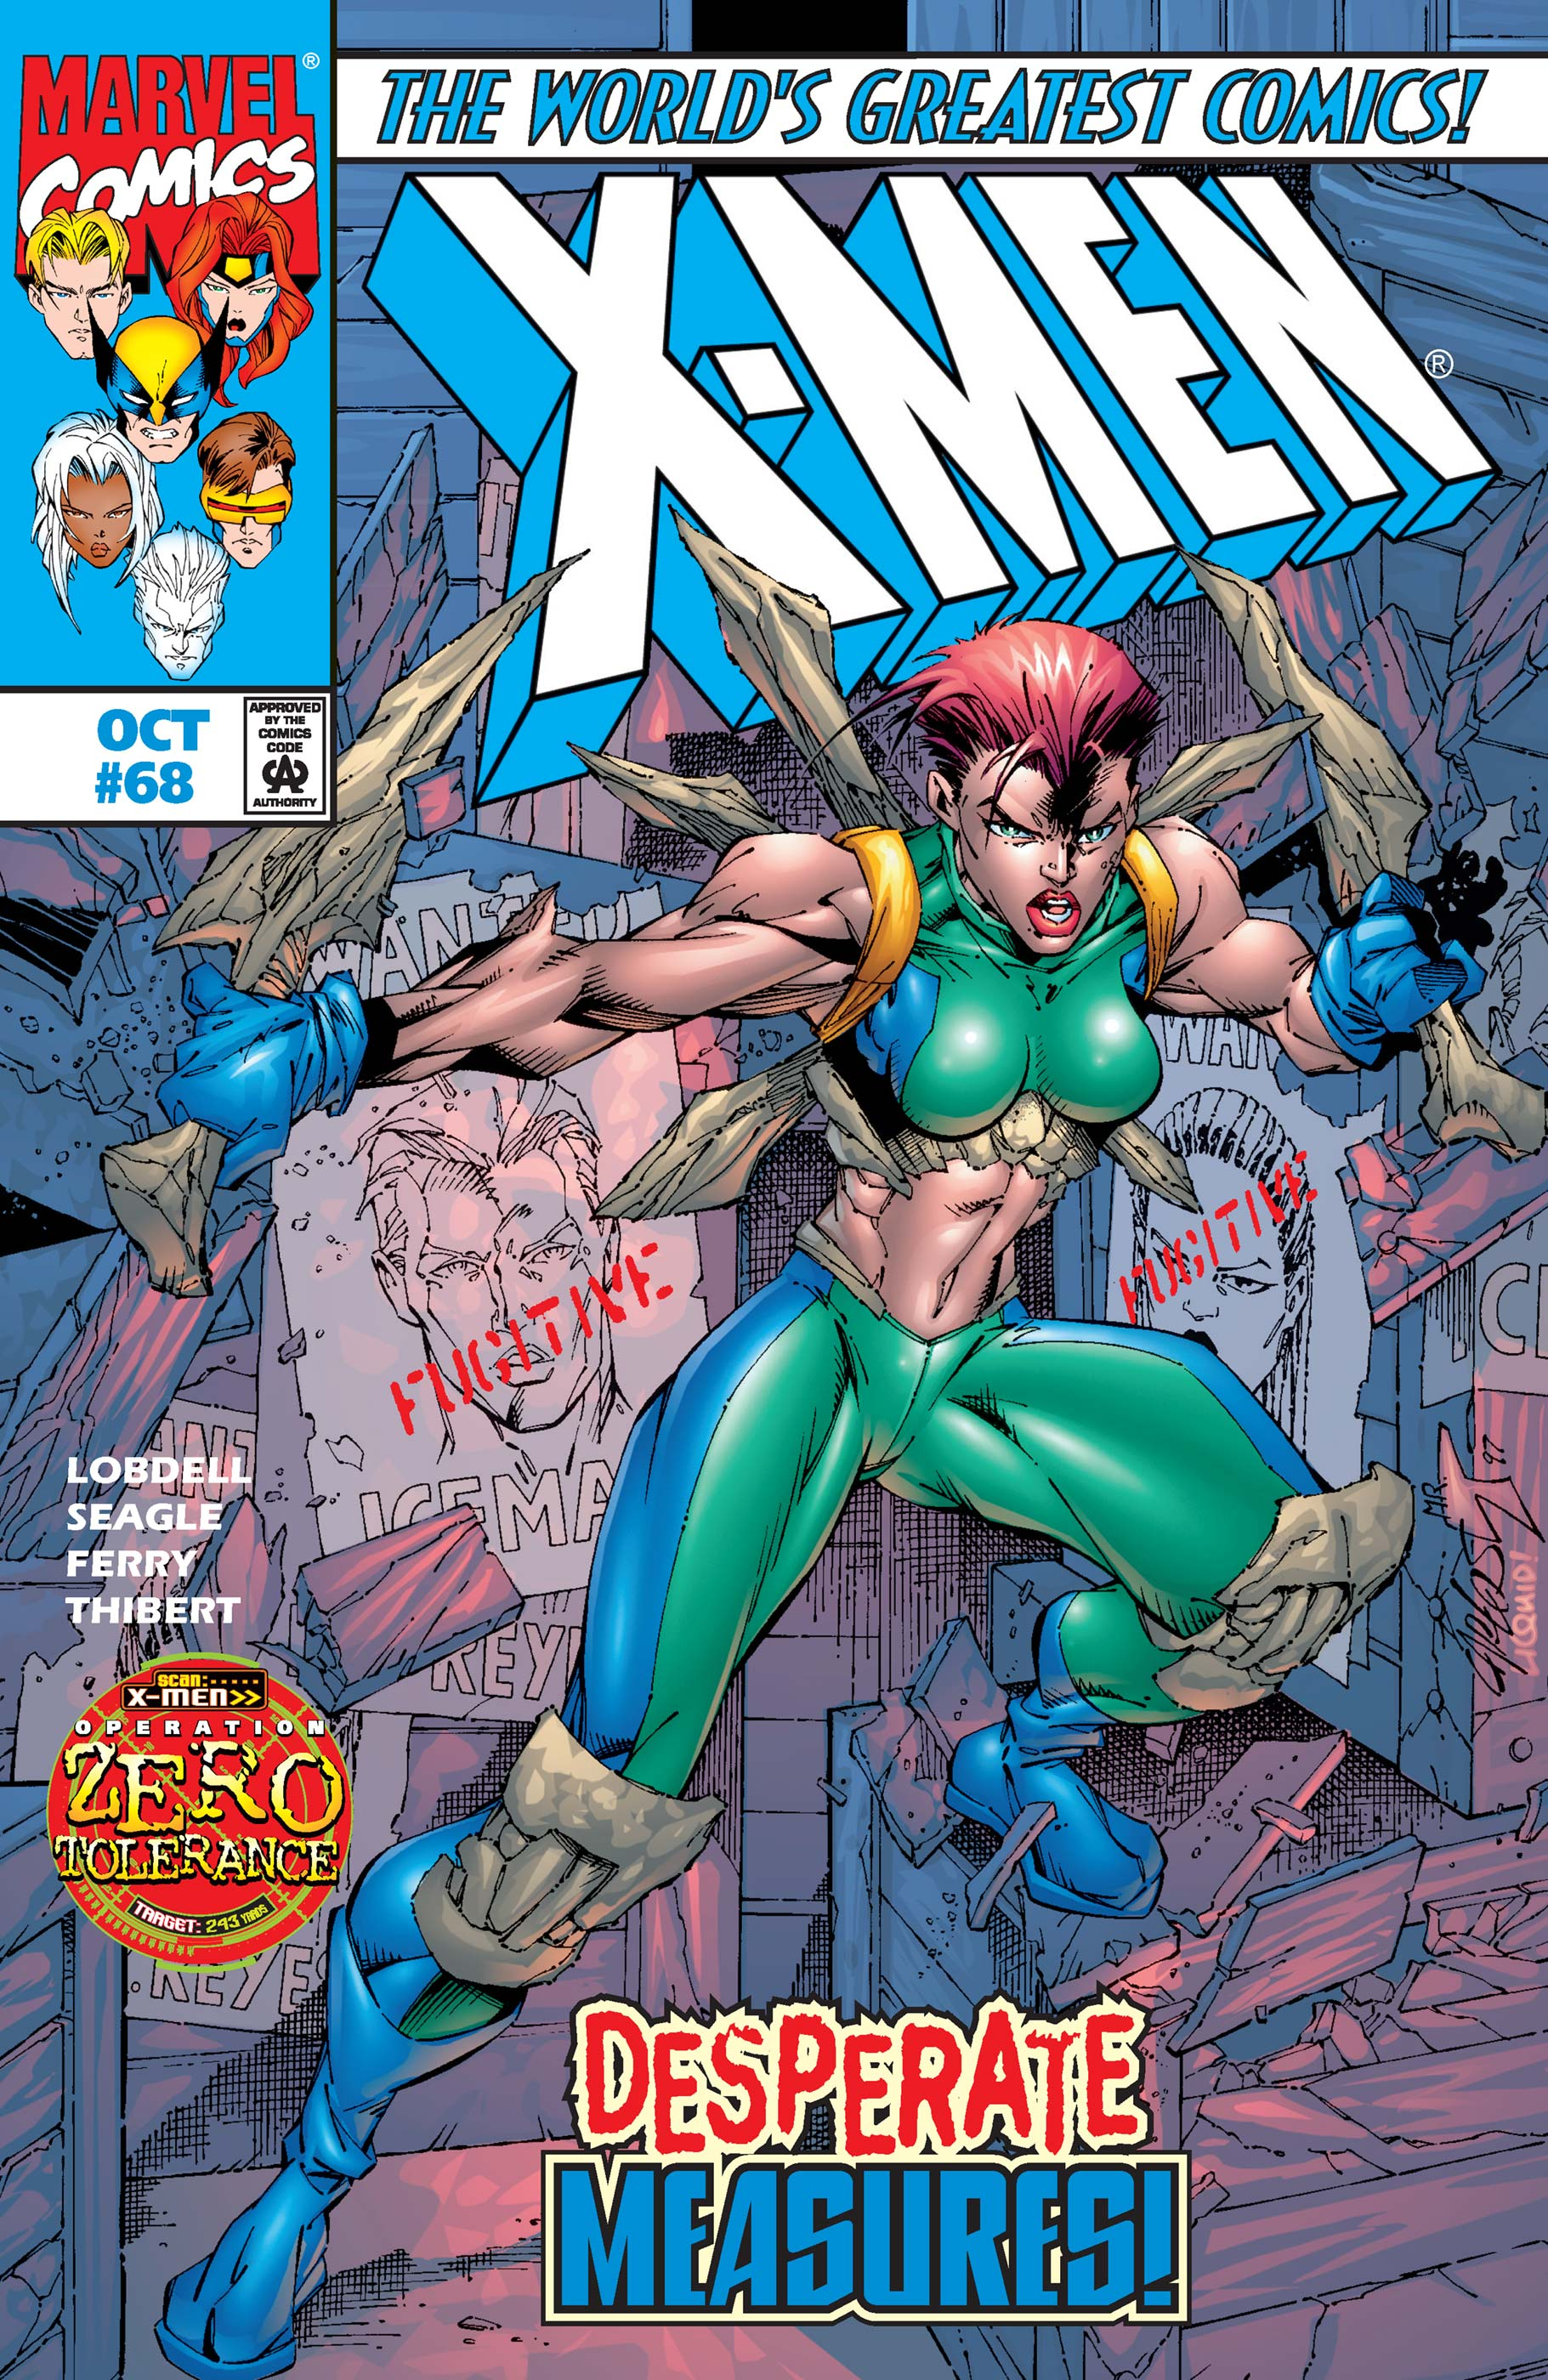 X-Men (1991) #68